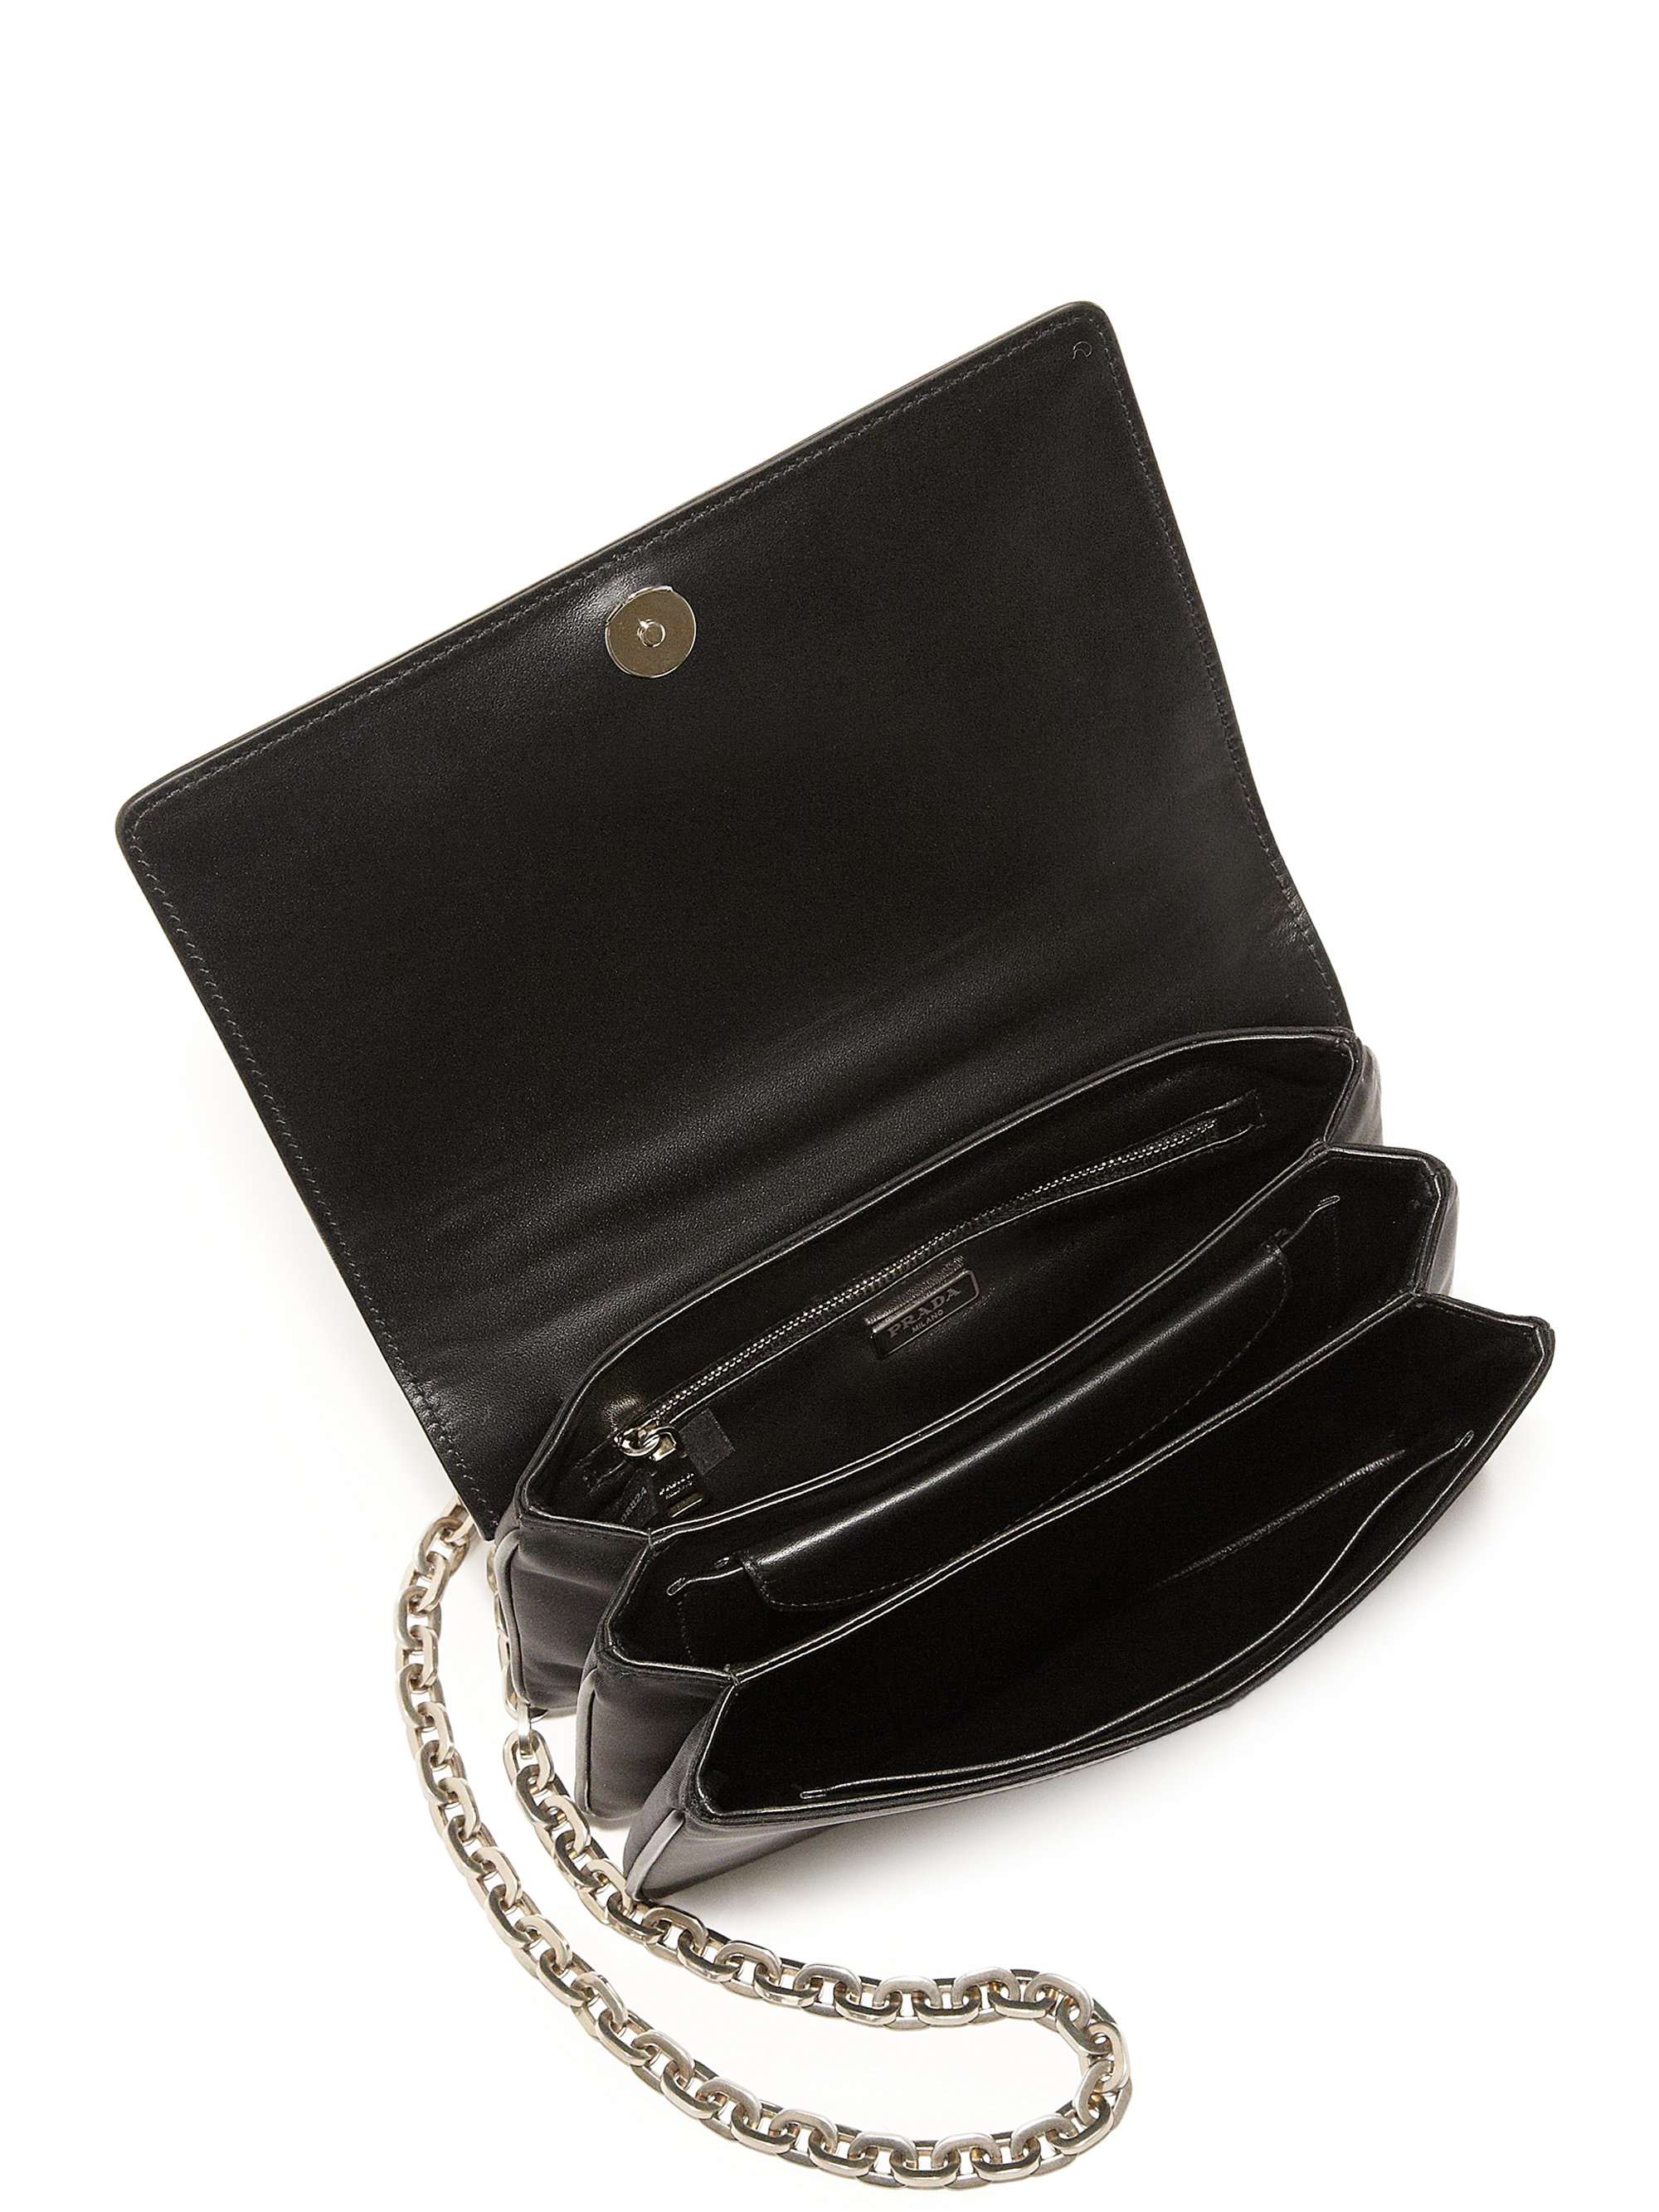 Prada Tessuto \u0026amp; Lizard Crossbody Bag in Silver (black-natural) | Lyst